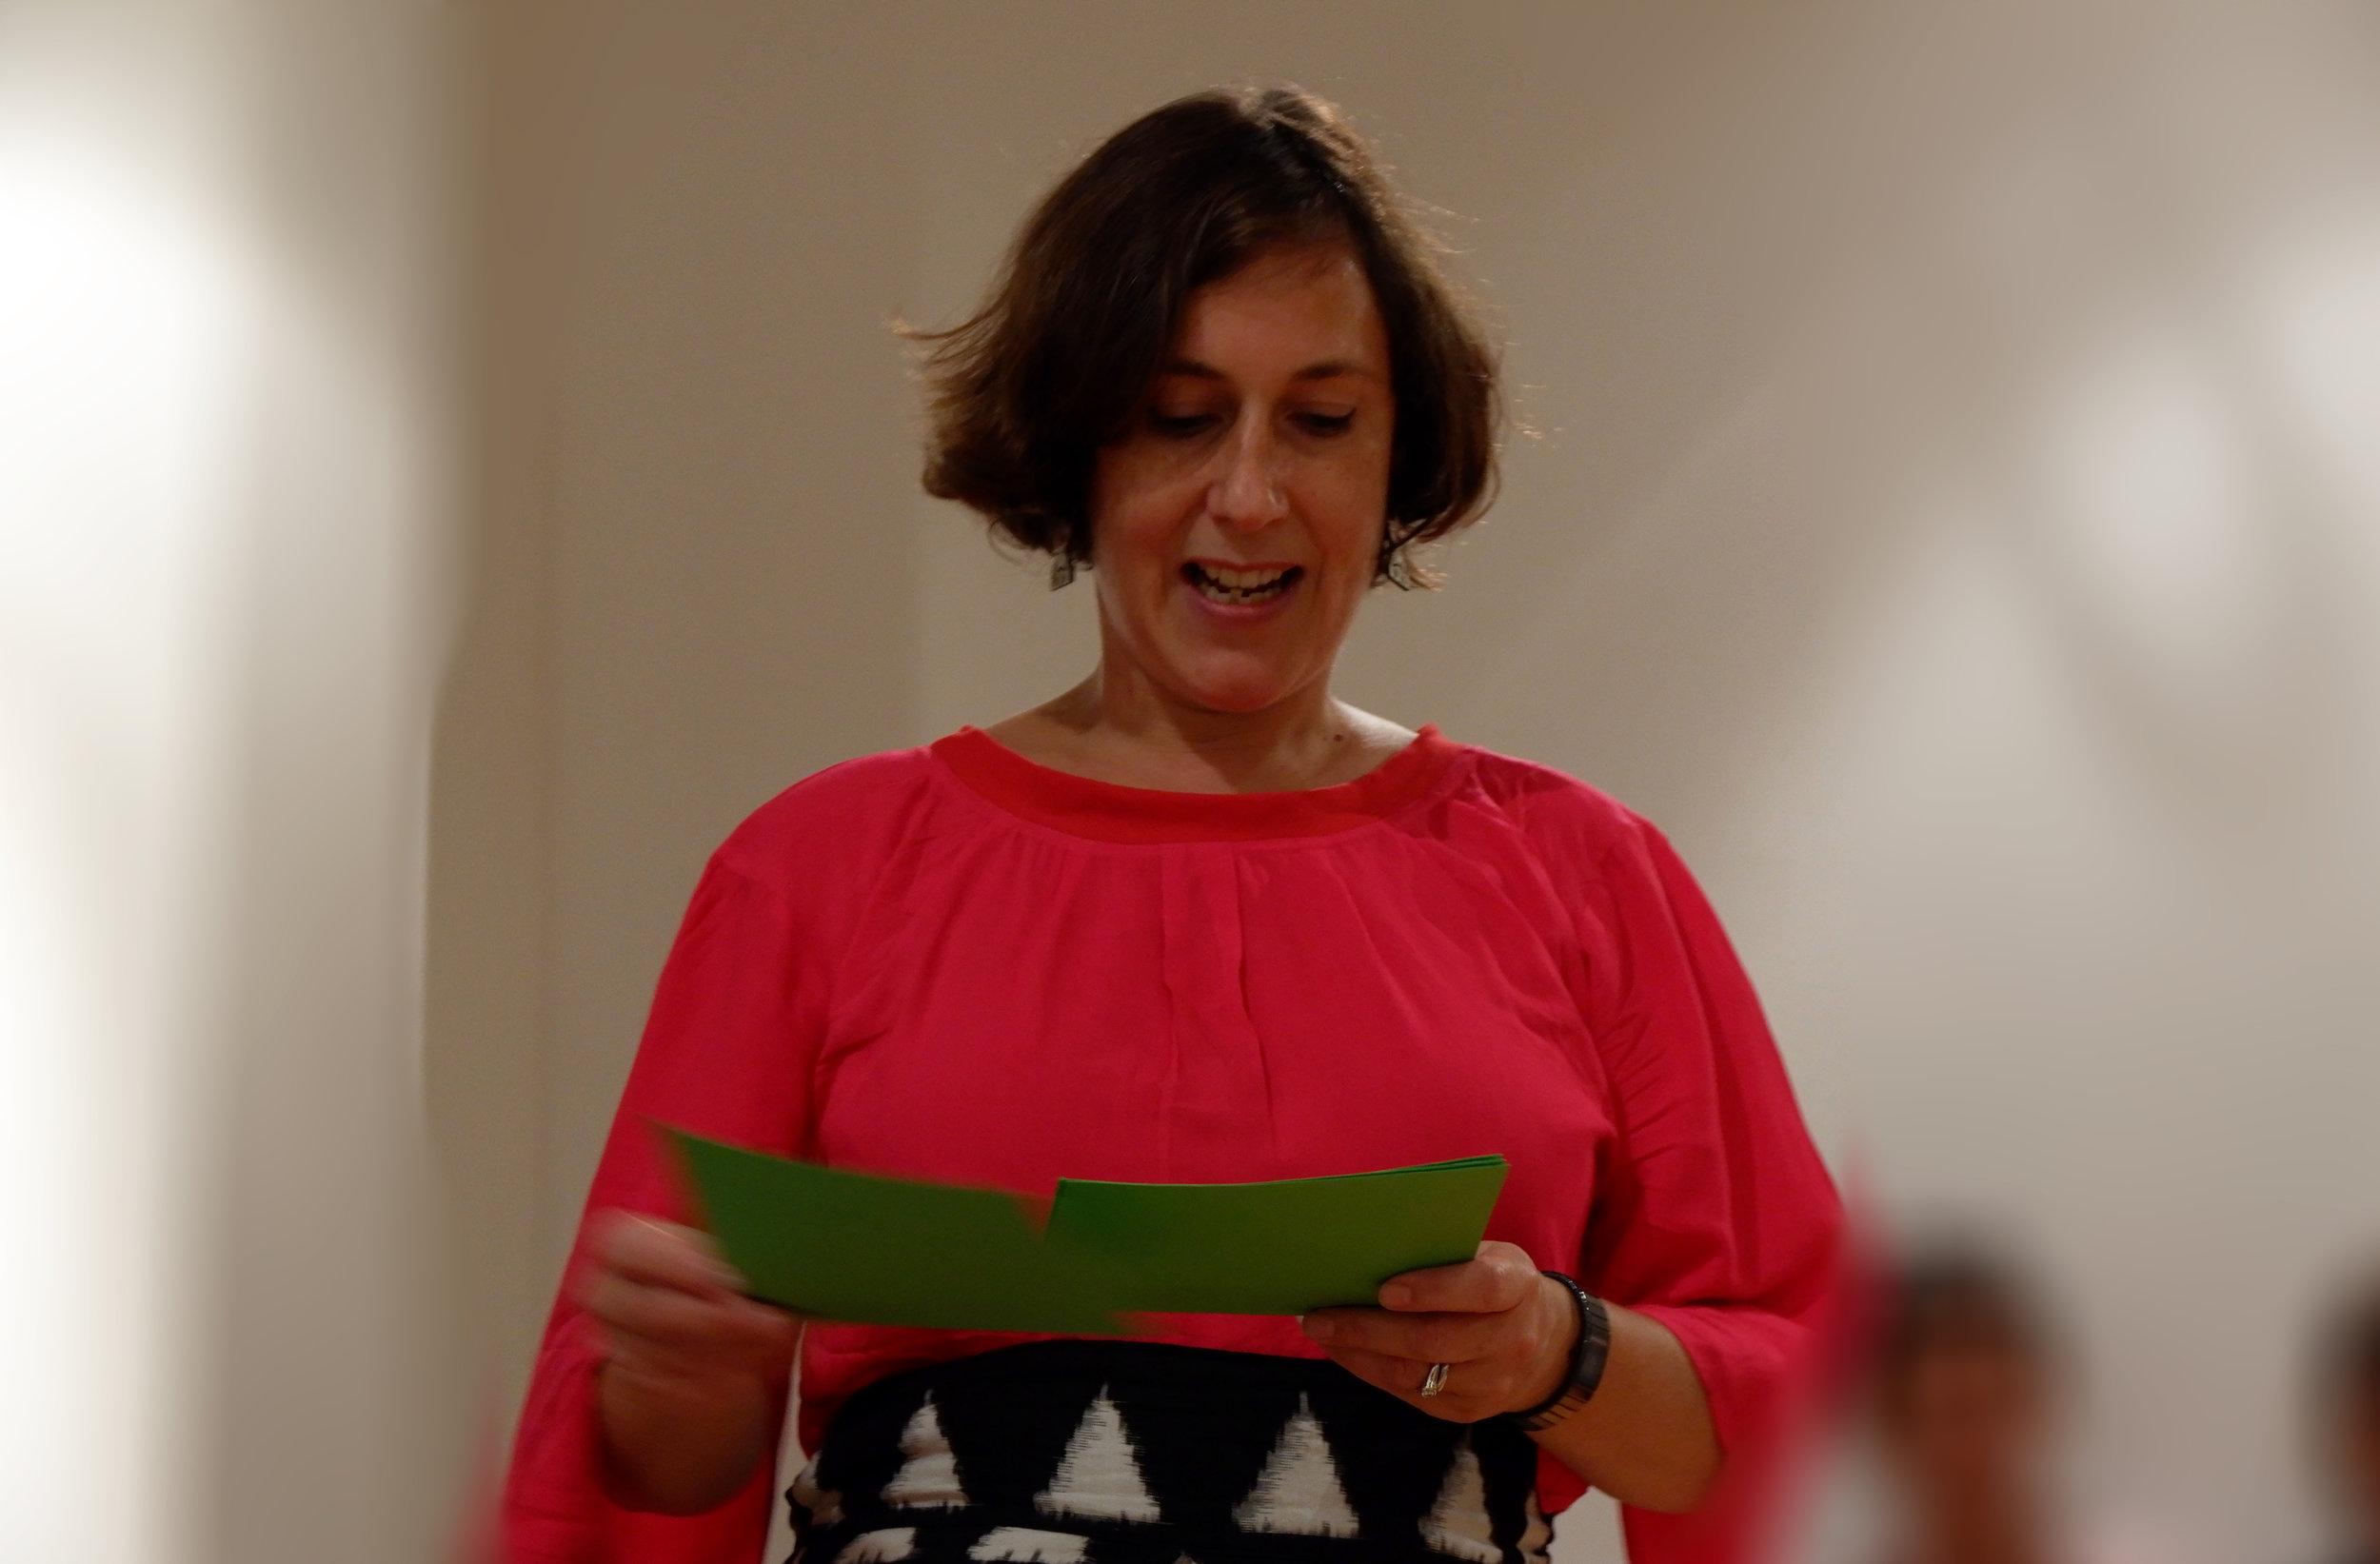 Eleine Friedlander, the founder of Nuwa, did a wonderful welcome speech.